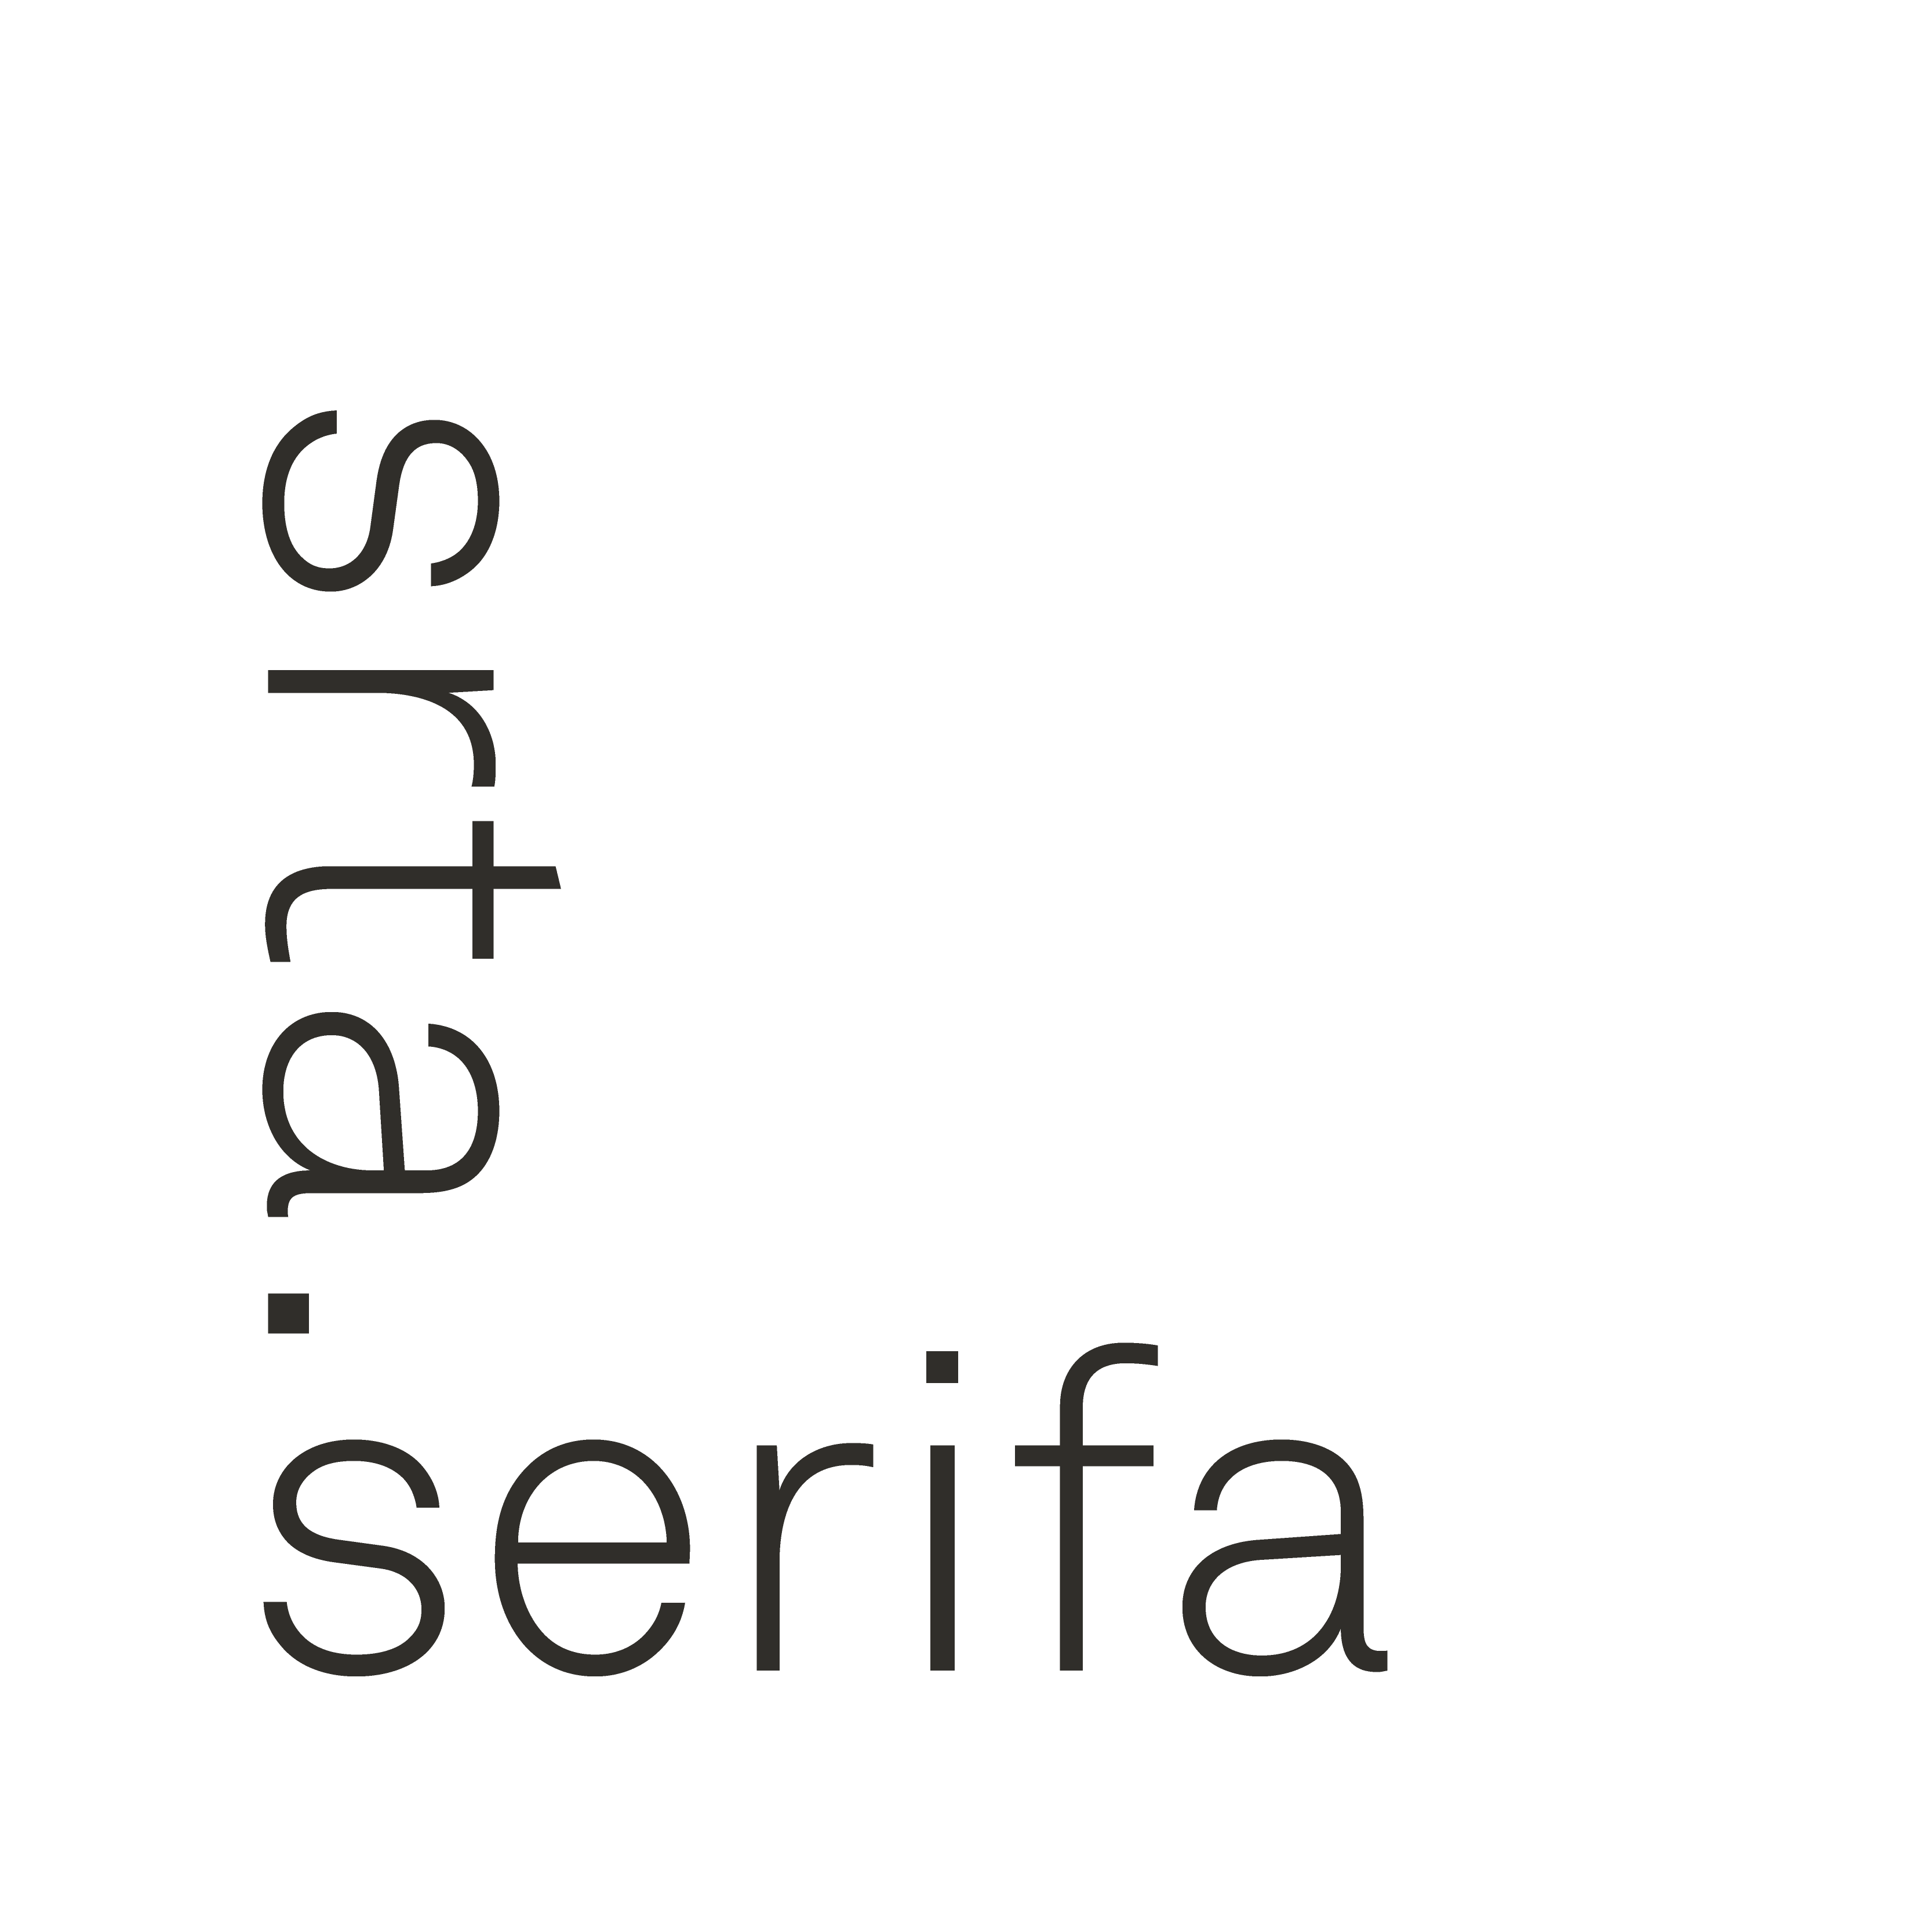 srta serifa